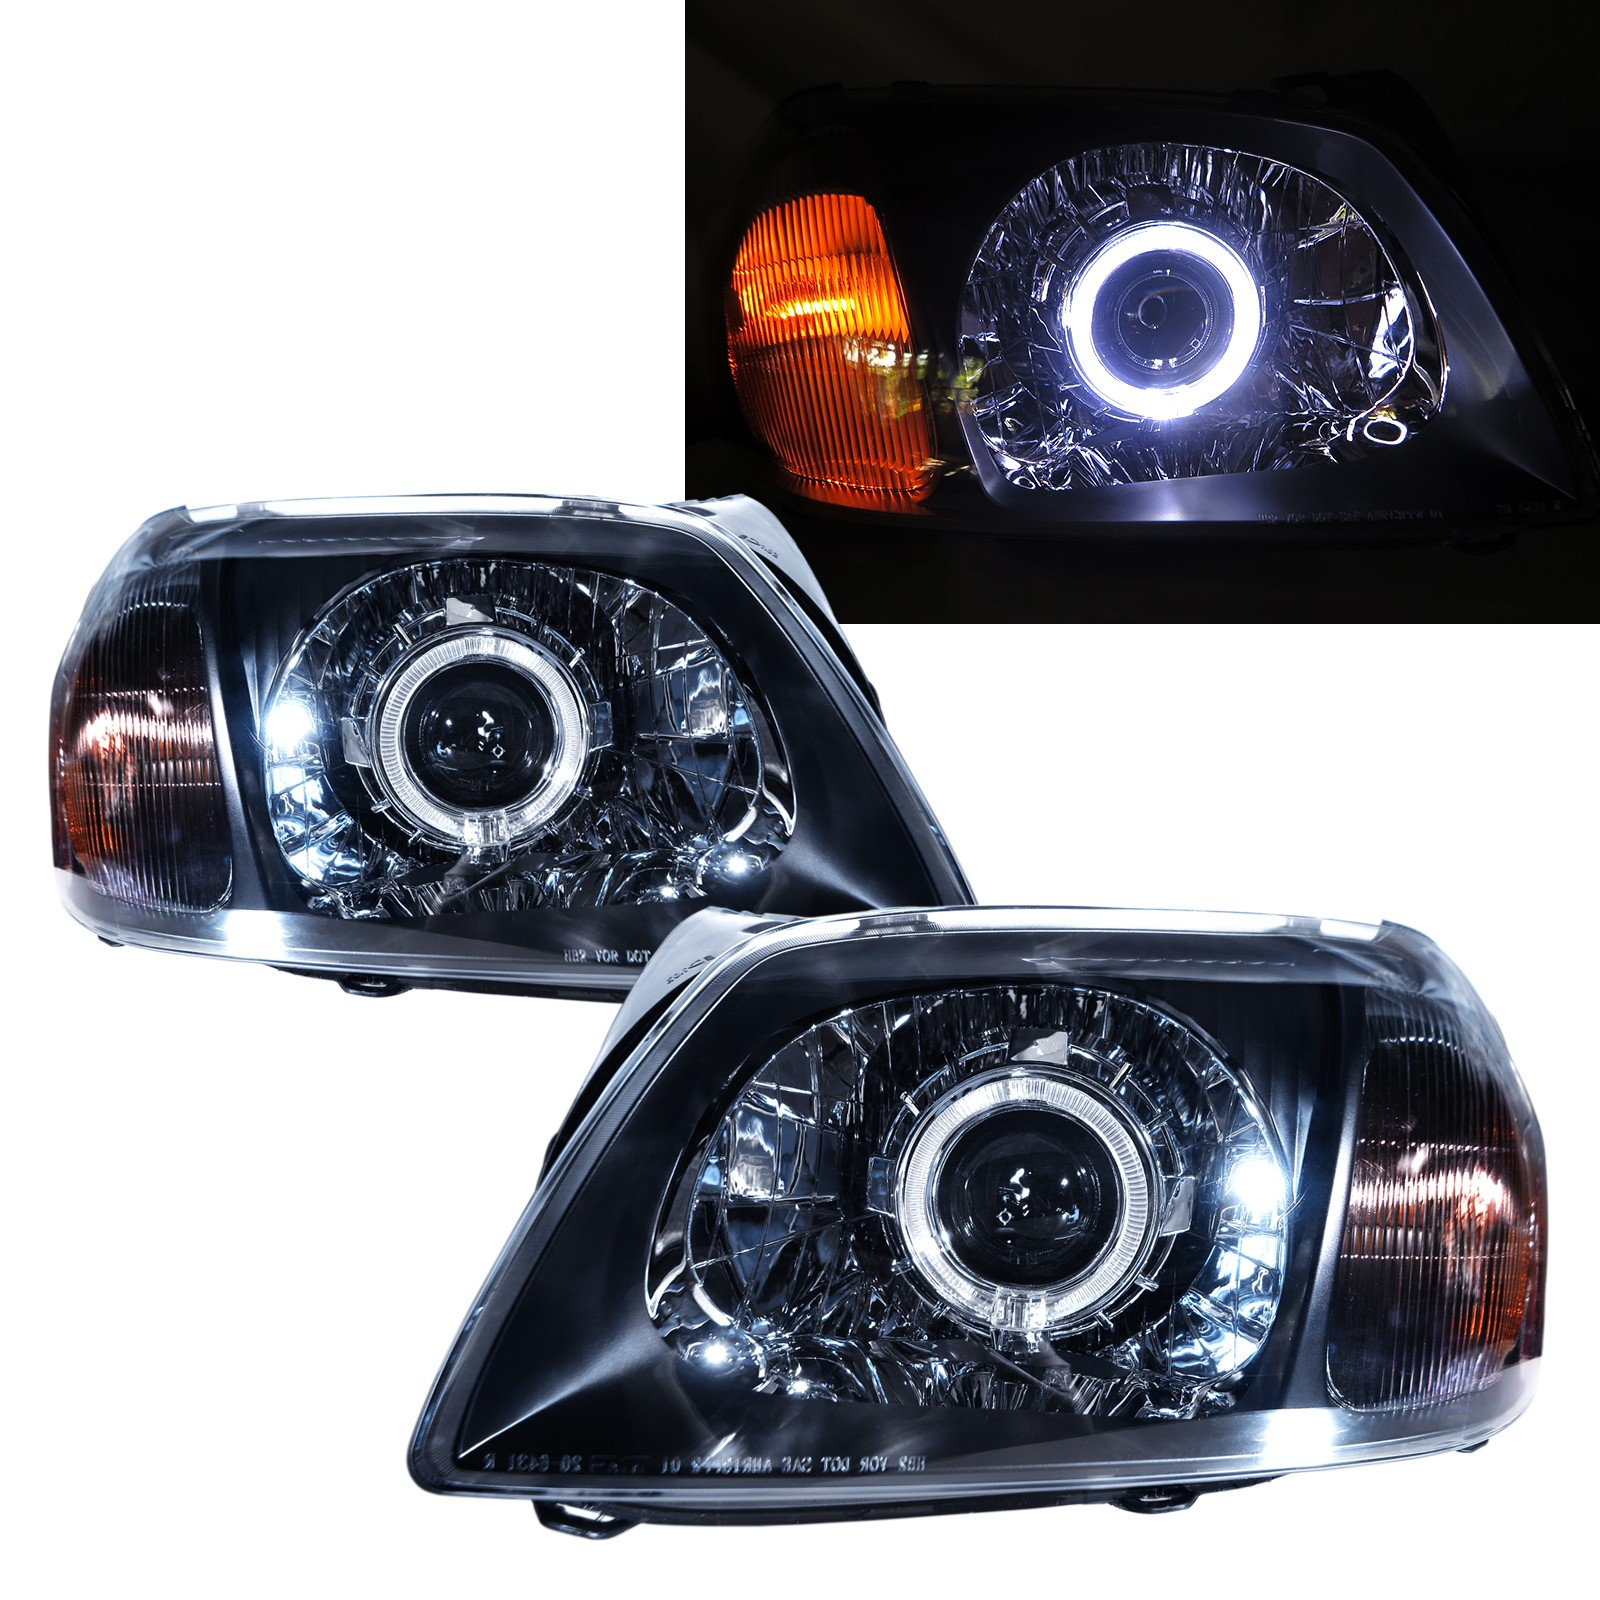 CrazyTheGod Tribute First generation 2001-2006 SUV 5D Guide LED Angel-Eye Projector Headlight Headlamp Black for MAZDA RHD